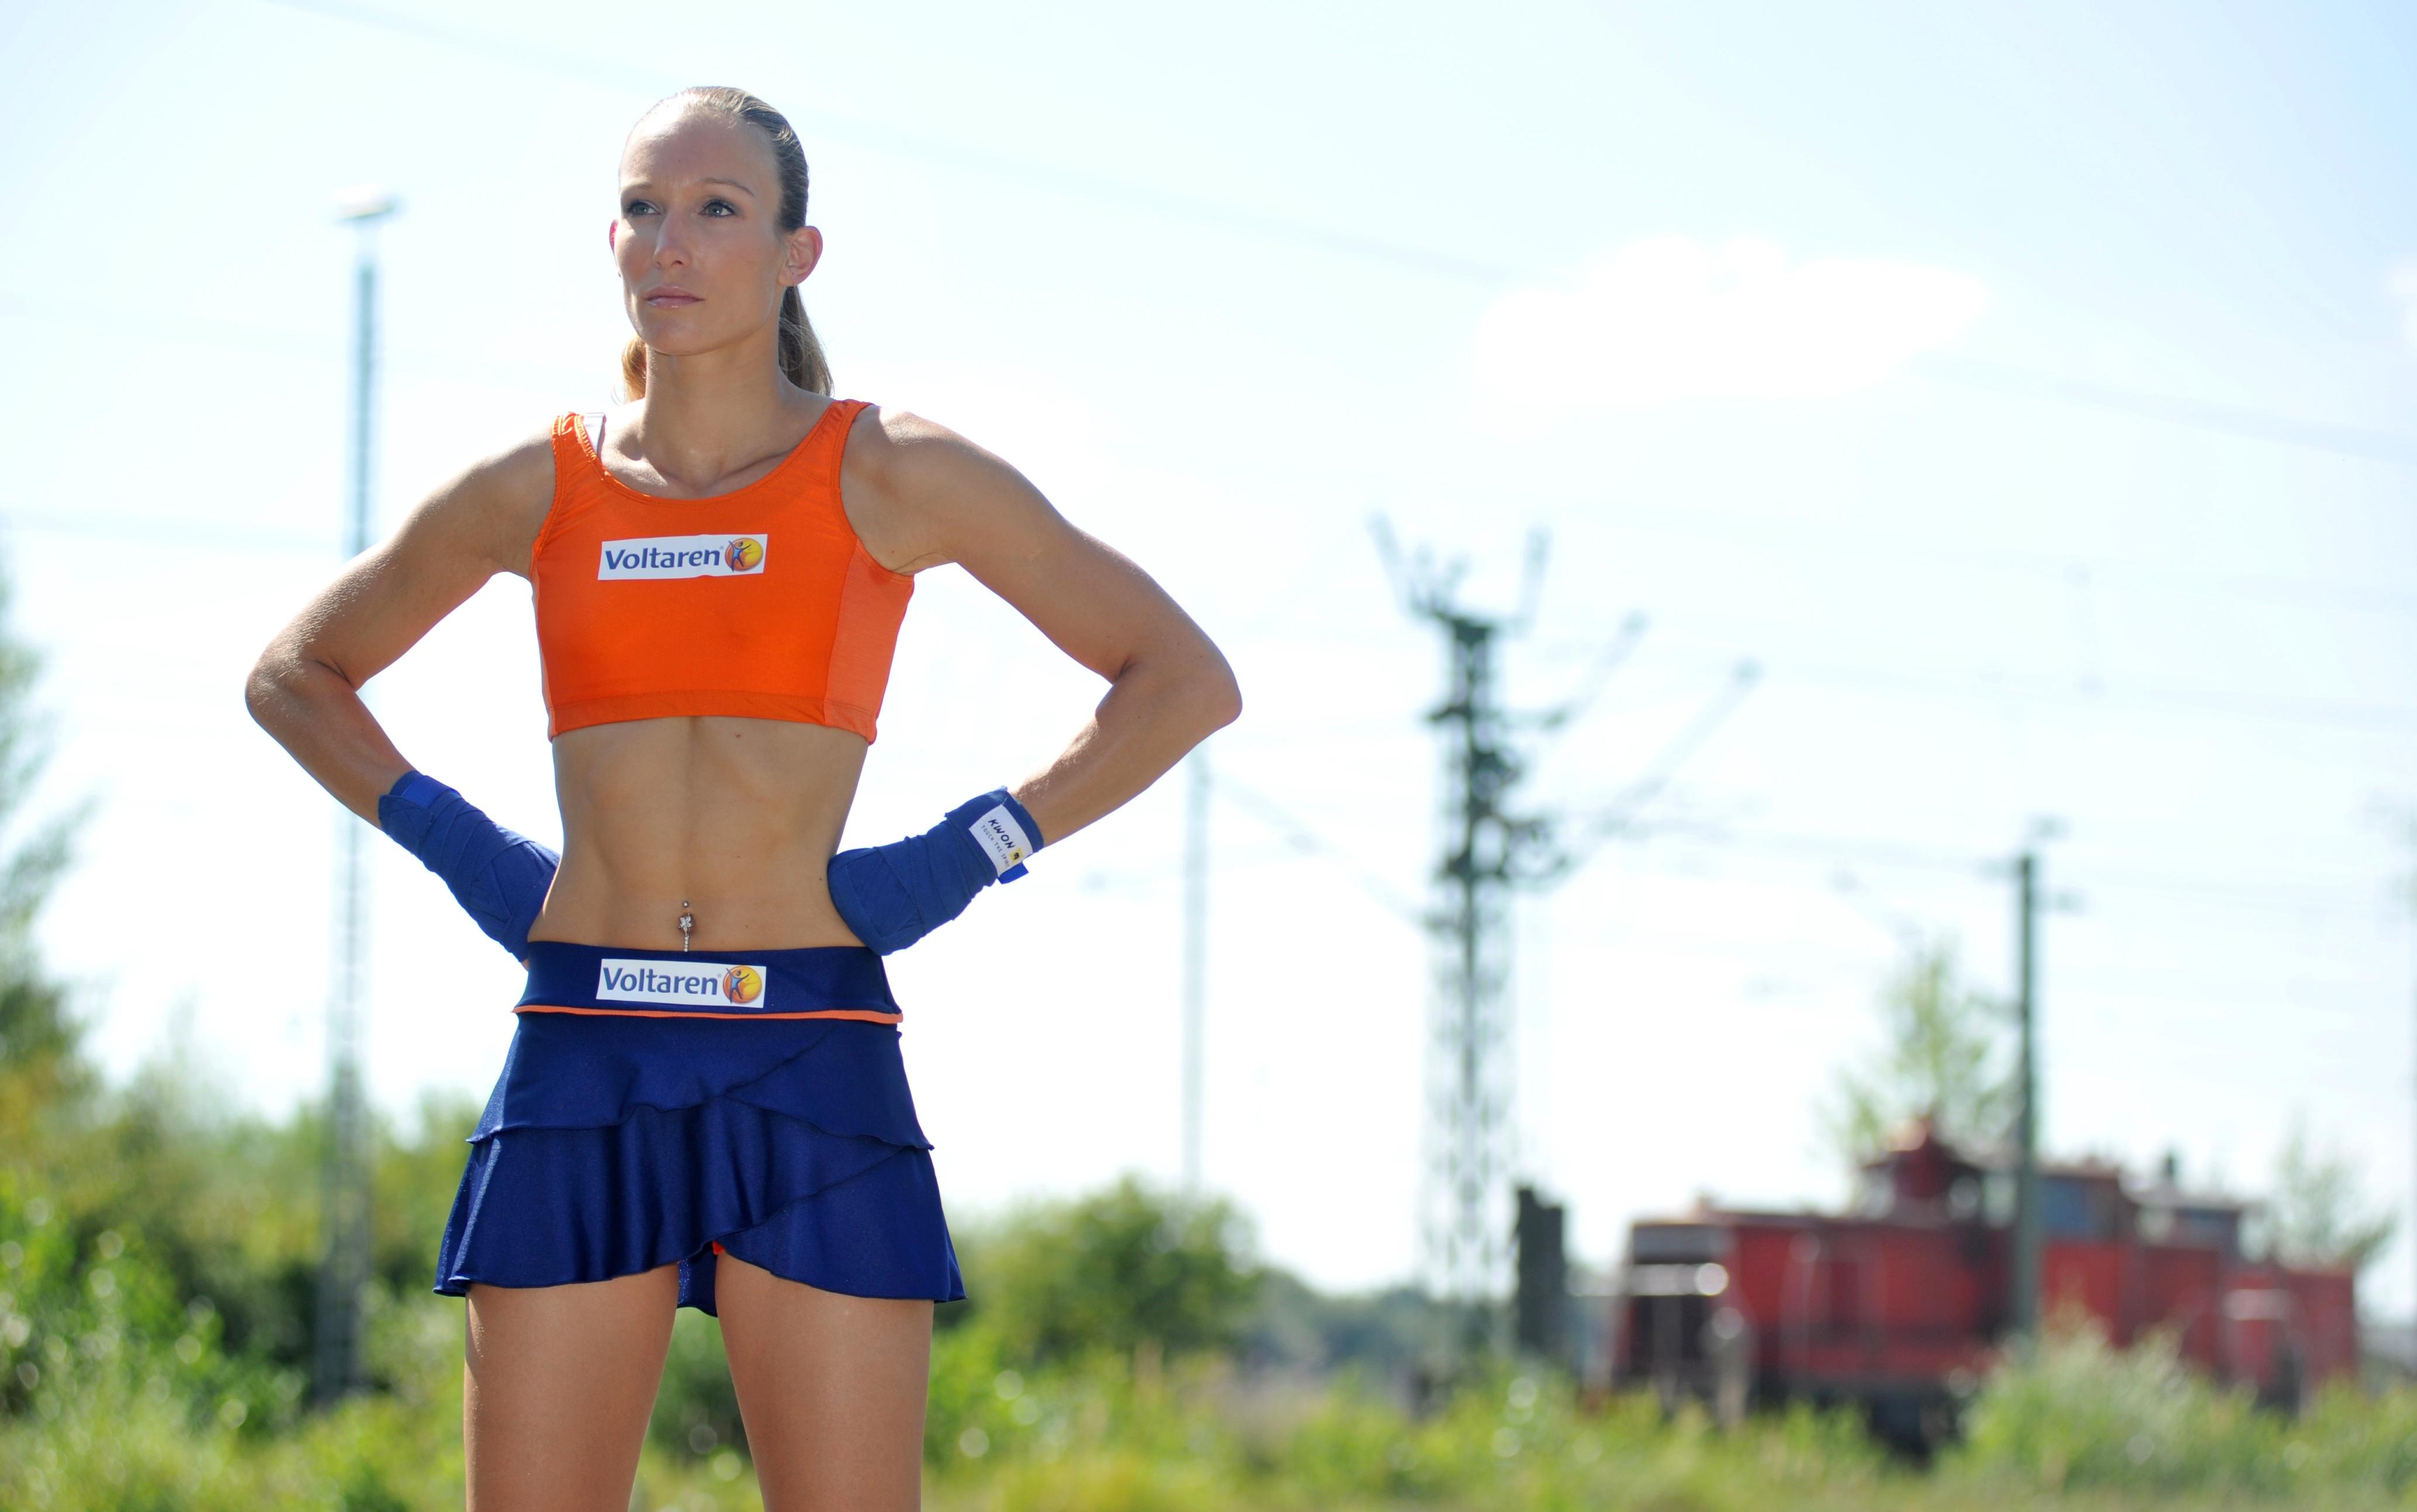 Christine Theiss Kickbox Photoshoot 2010 06